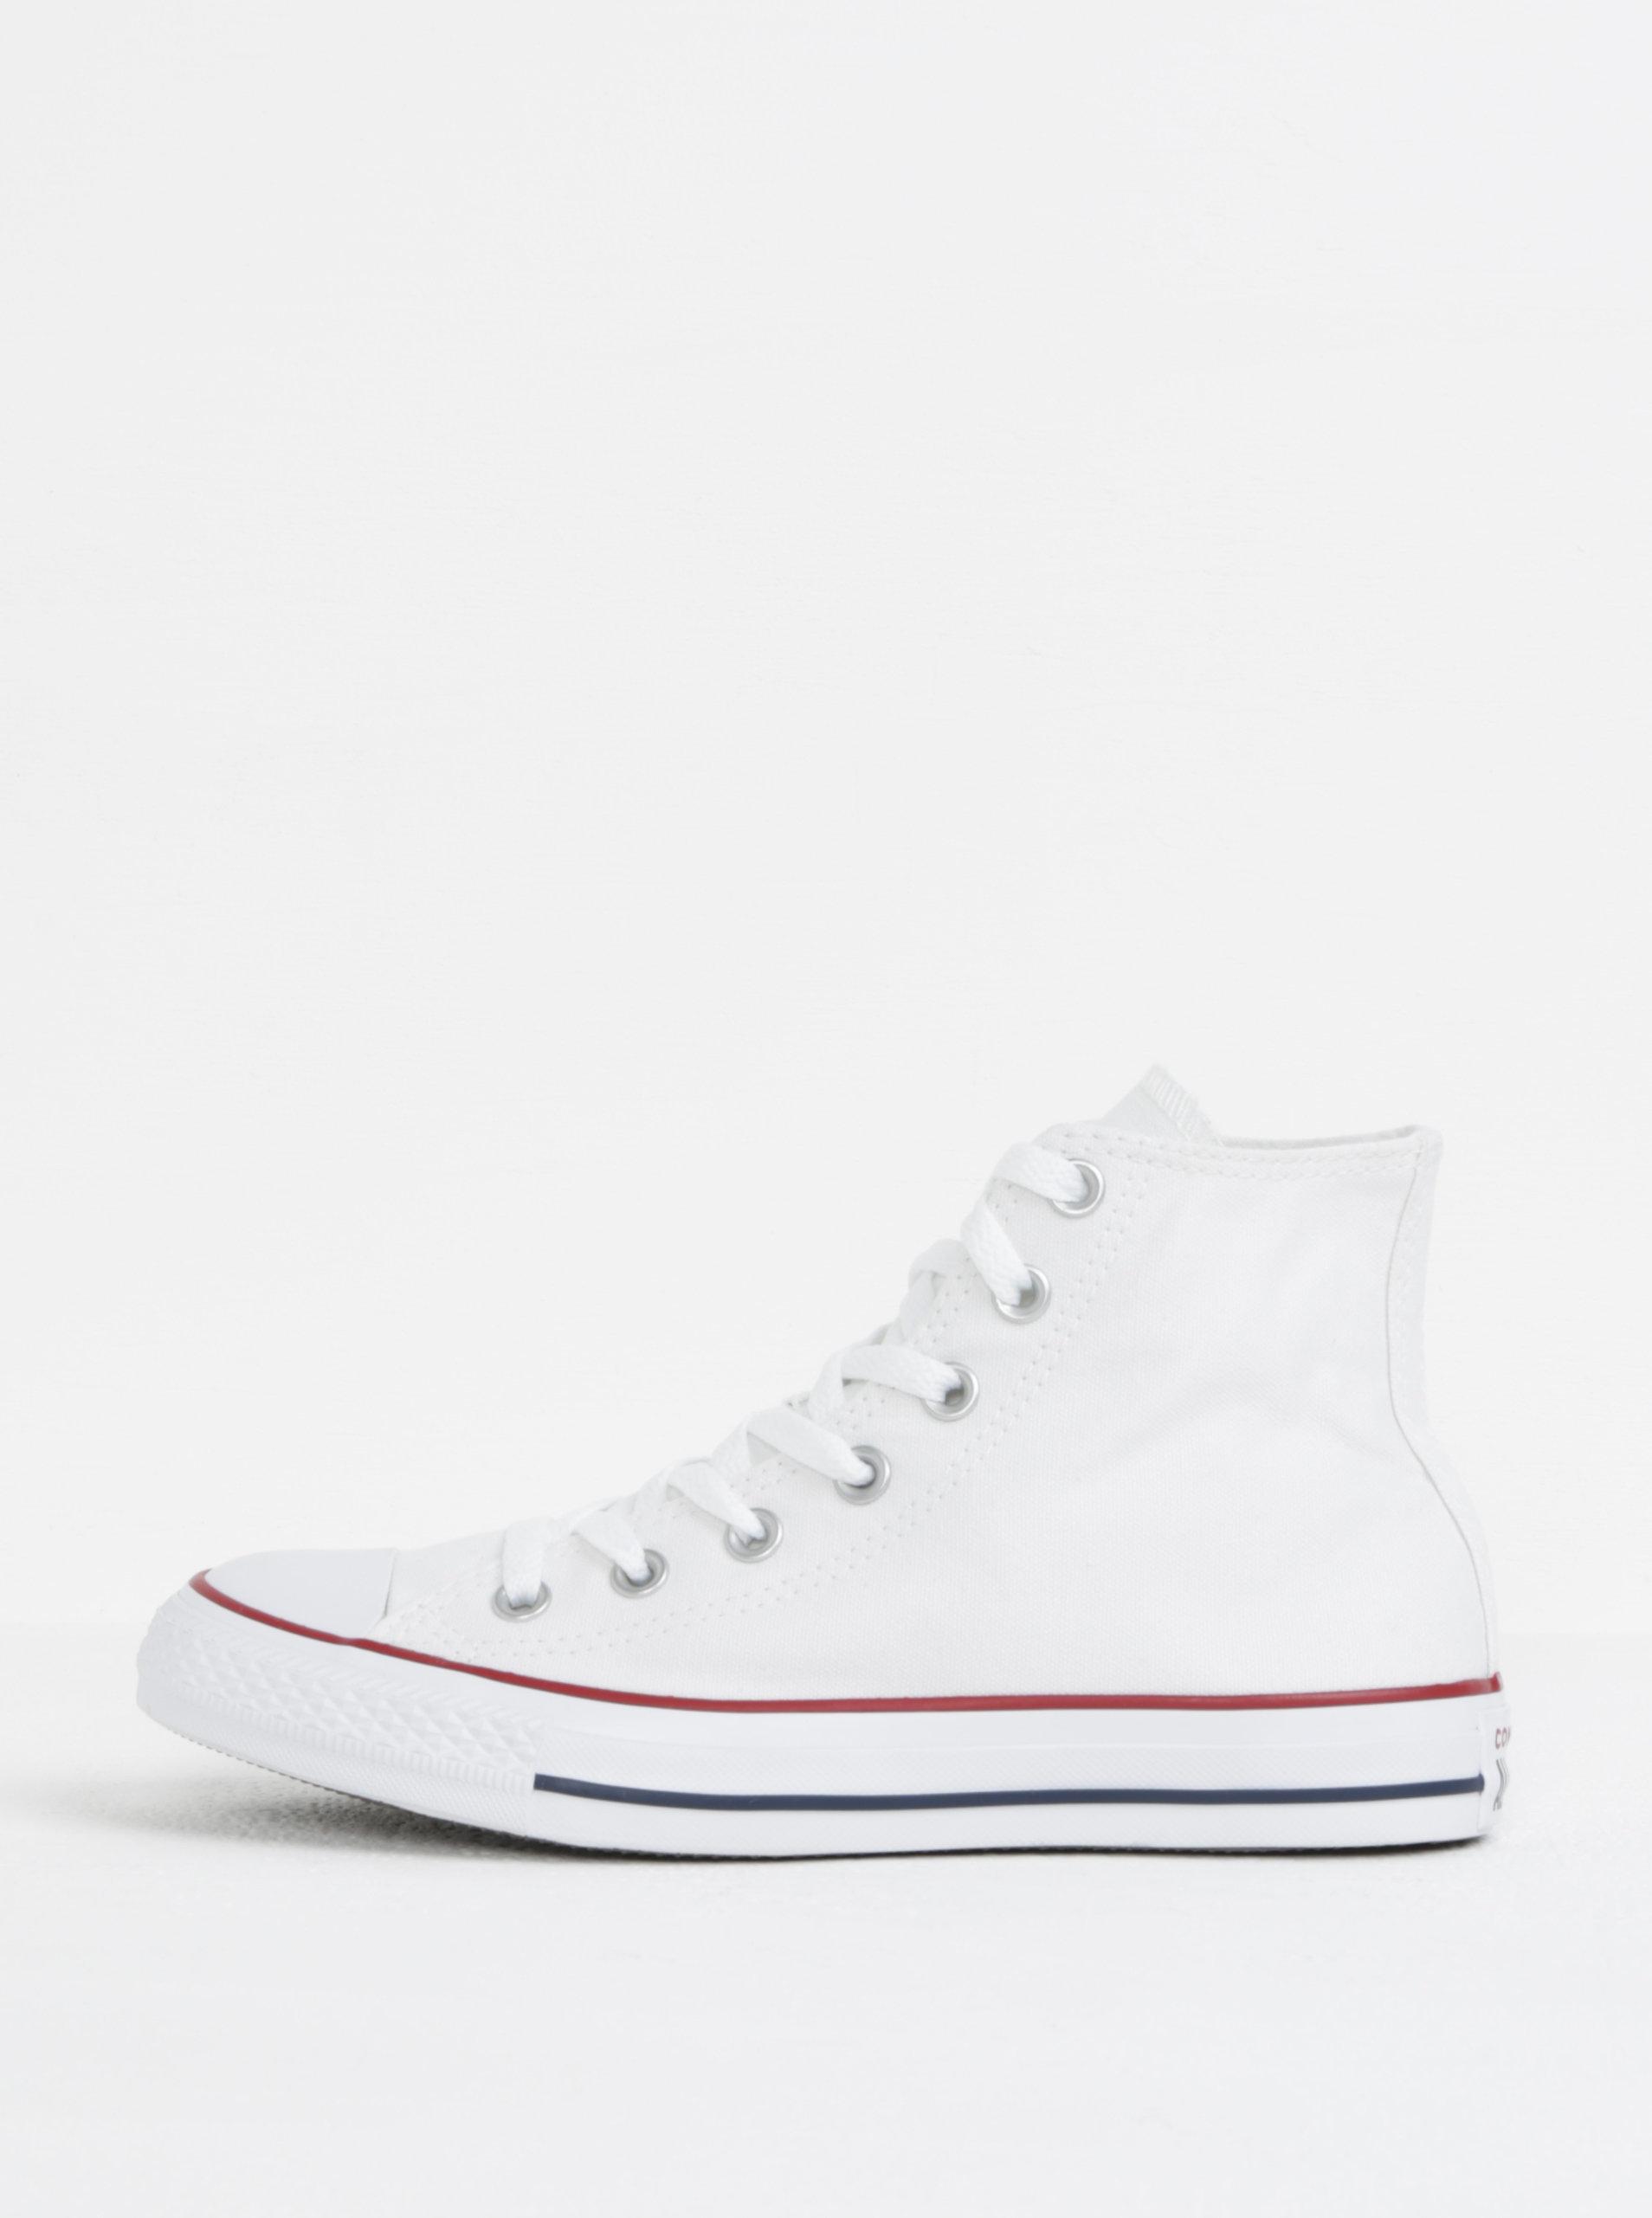 46df176b7ad Bílé kotníkové tenisky Converse Chuck Taylor All Star ...